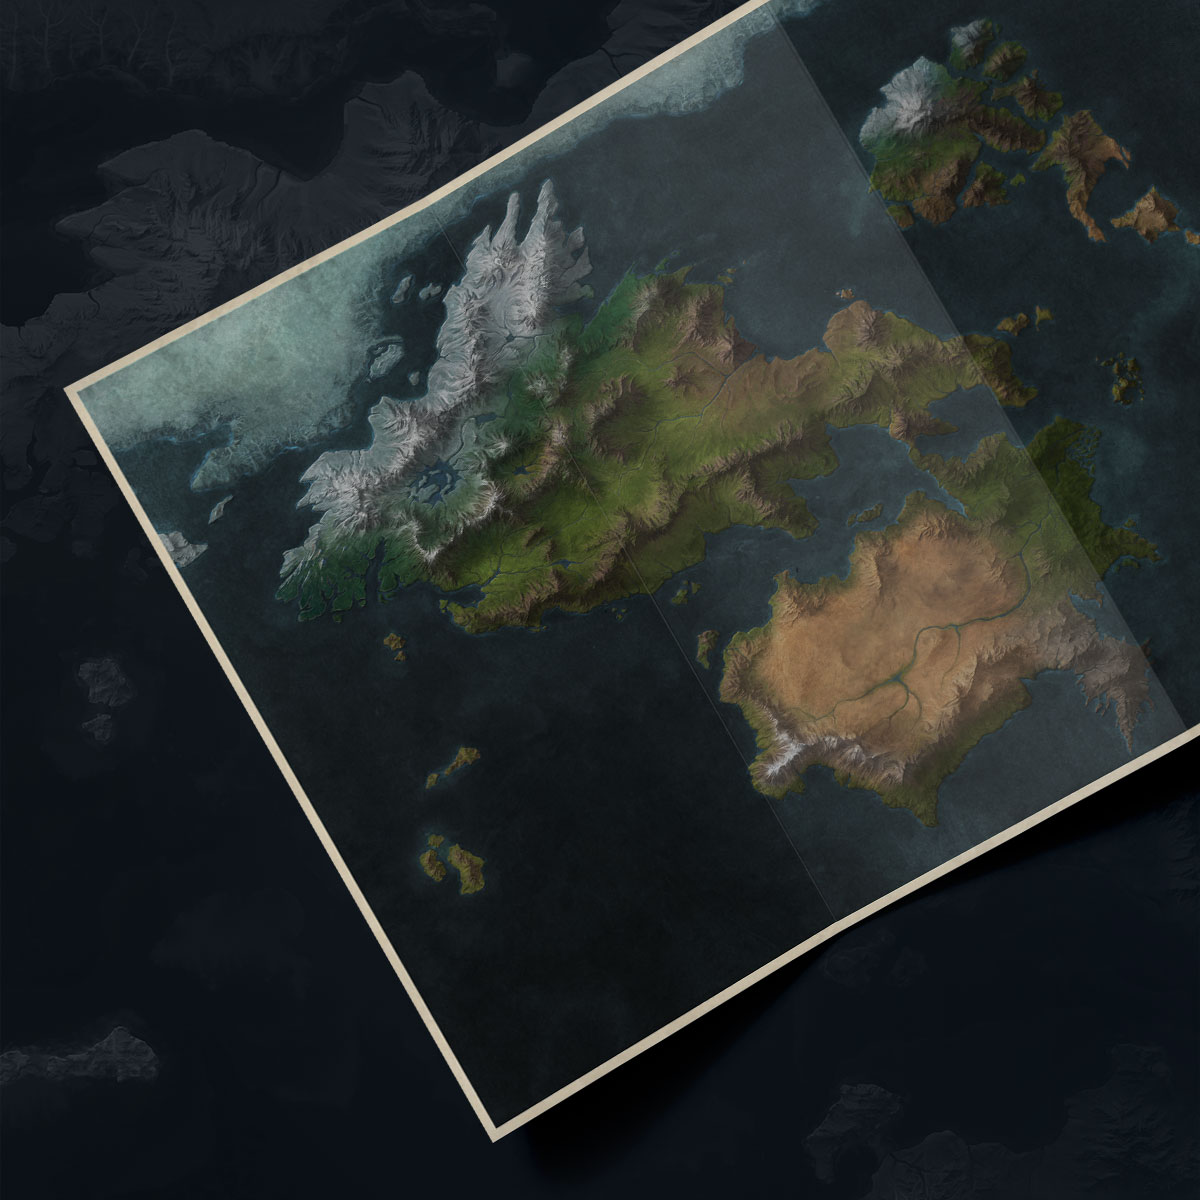 map.leagueoflegends.com